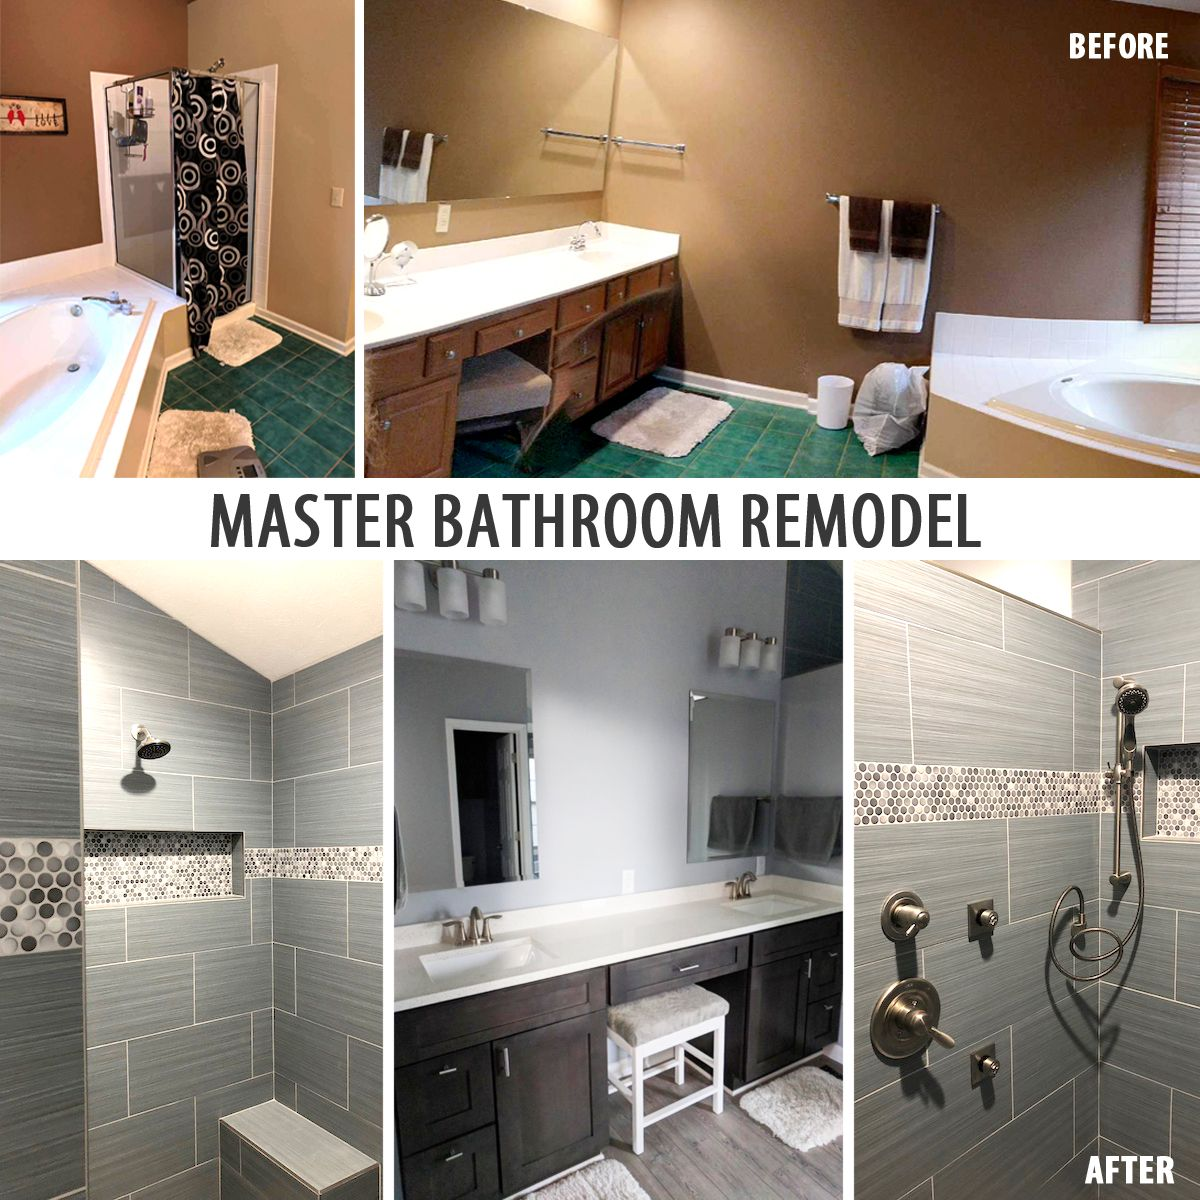 Projects Bathrooms Remodel Bathroom Remodel Master Remodel